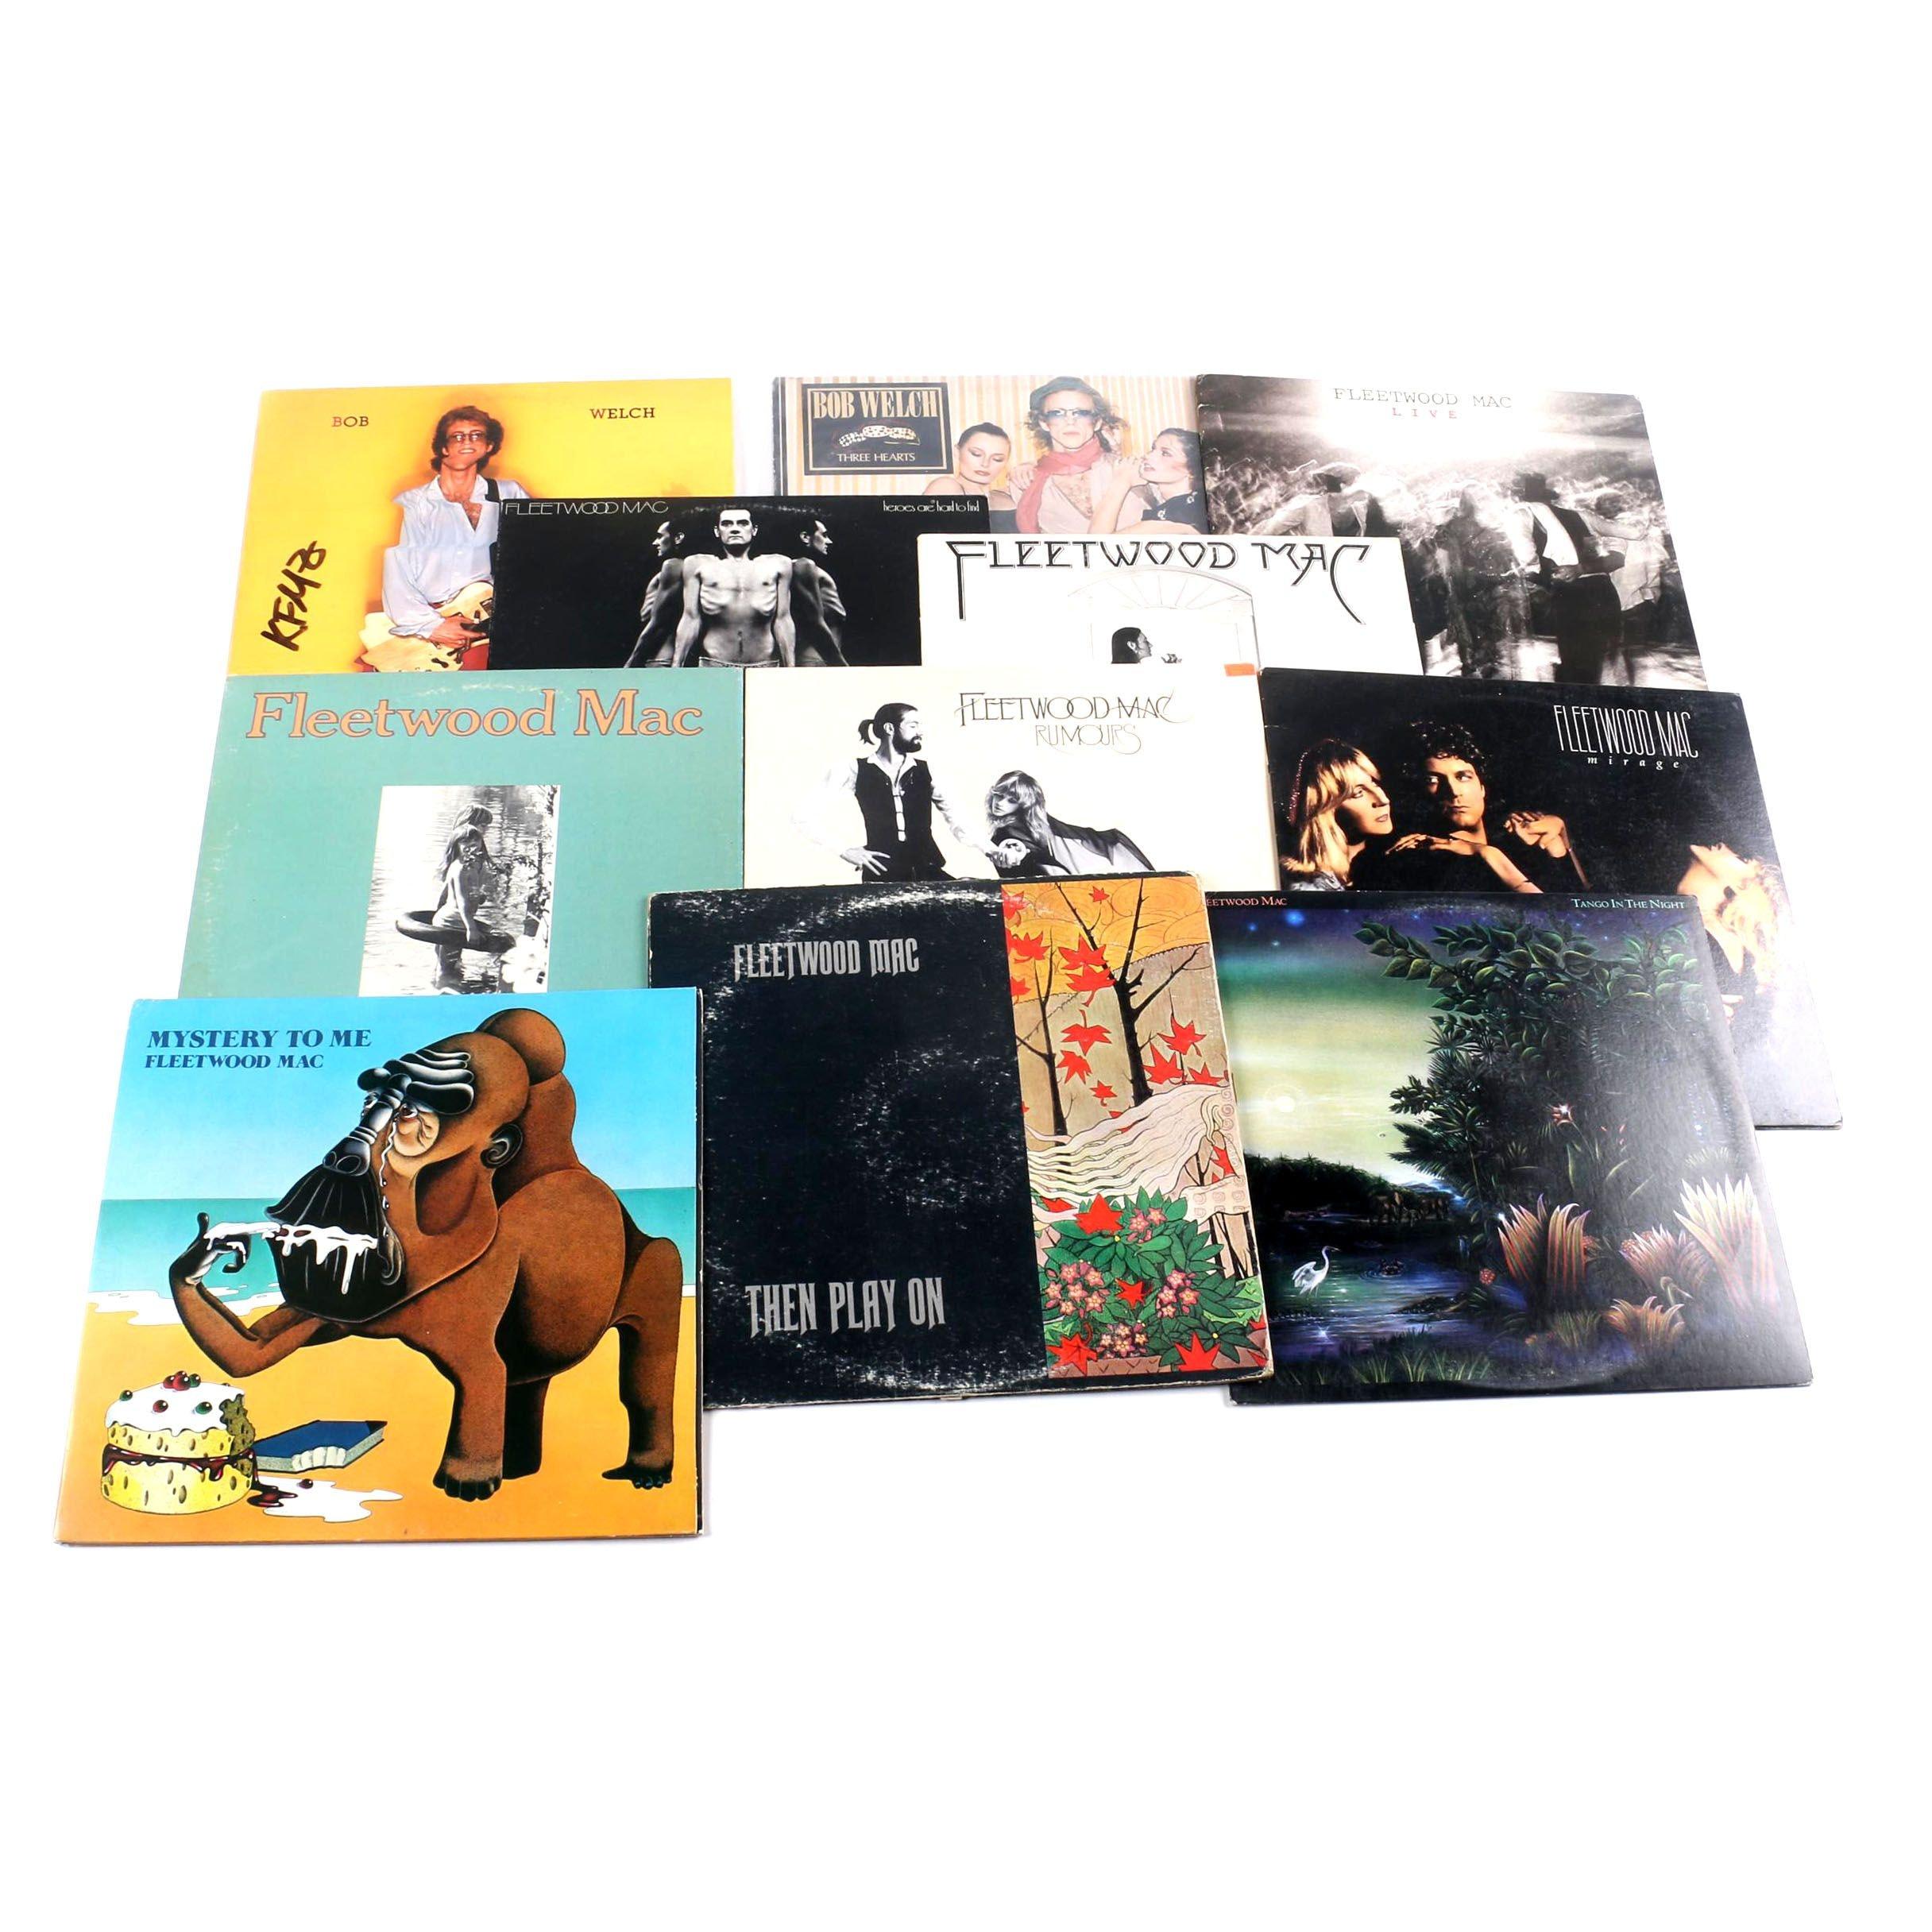 Fleetwood Mac and Bob Welch LPs